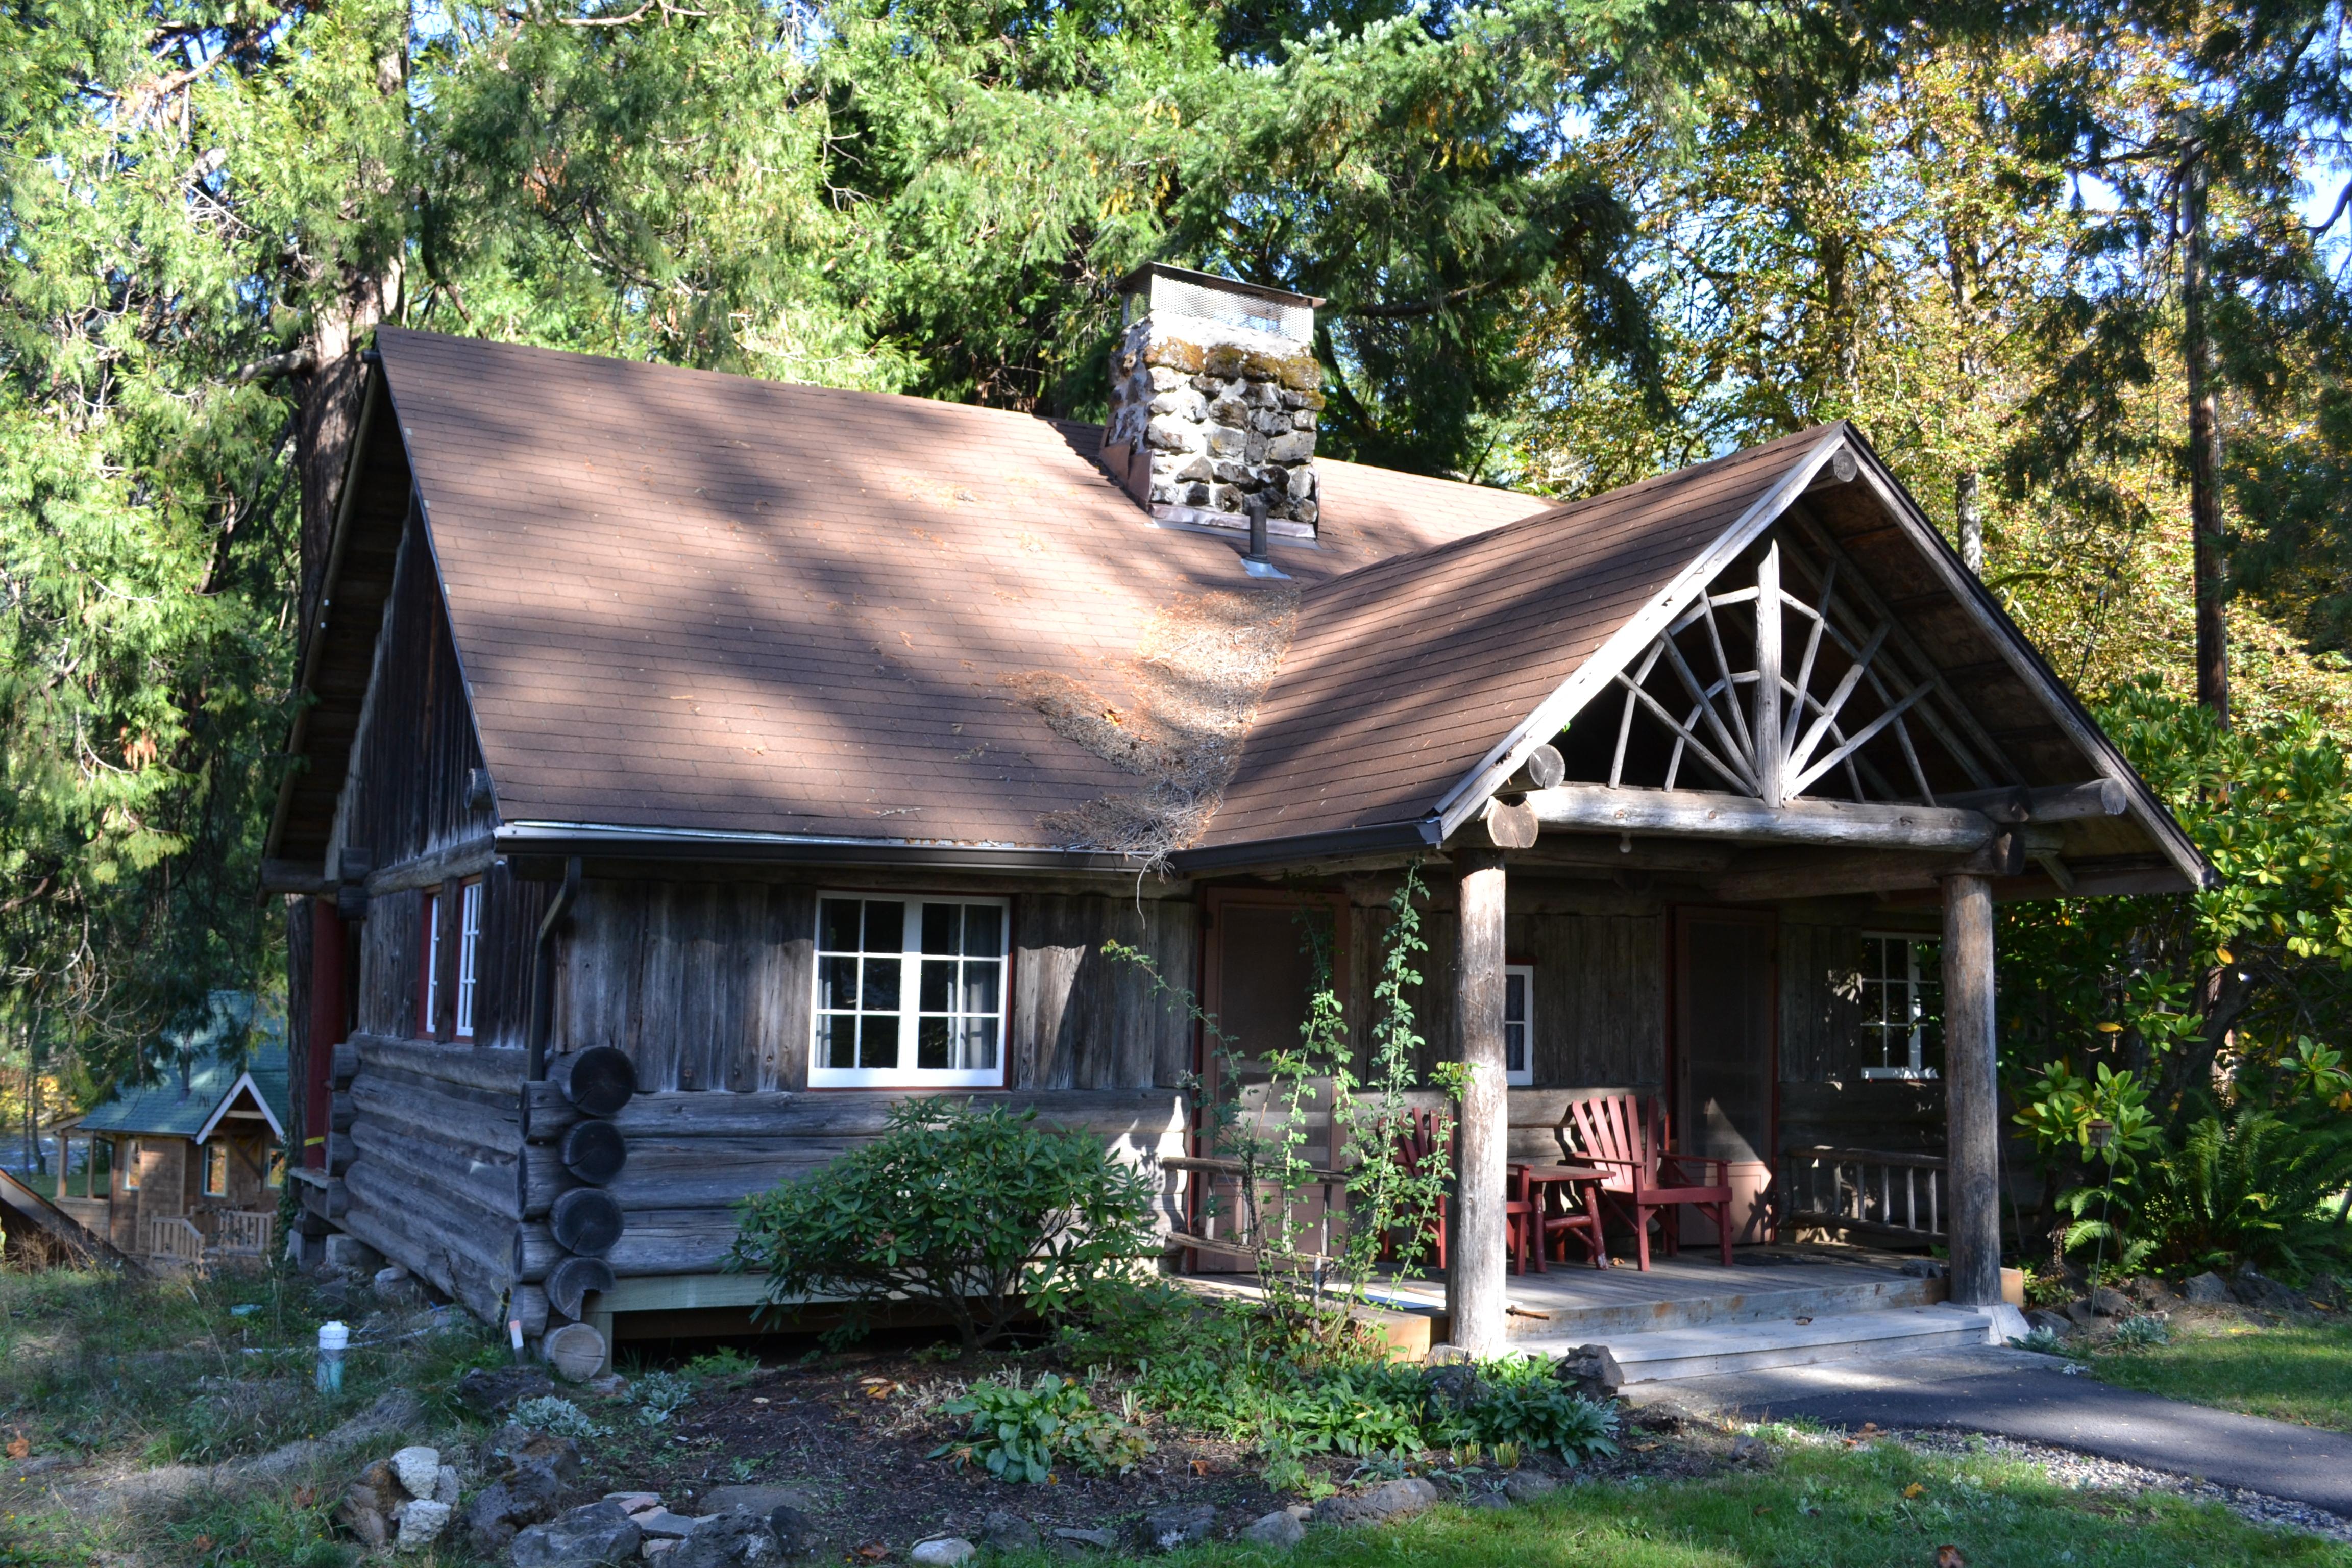 Ordinaire File:Hoover Cabin, Log Cabin Inn (McKenzie Bridge, Oregon)